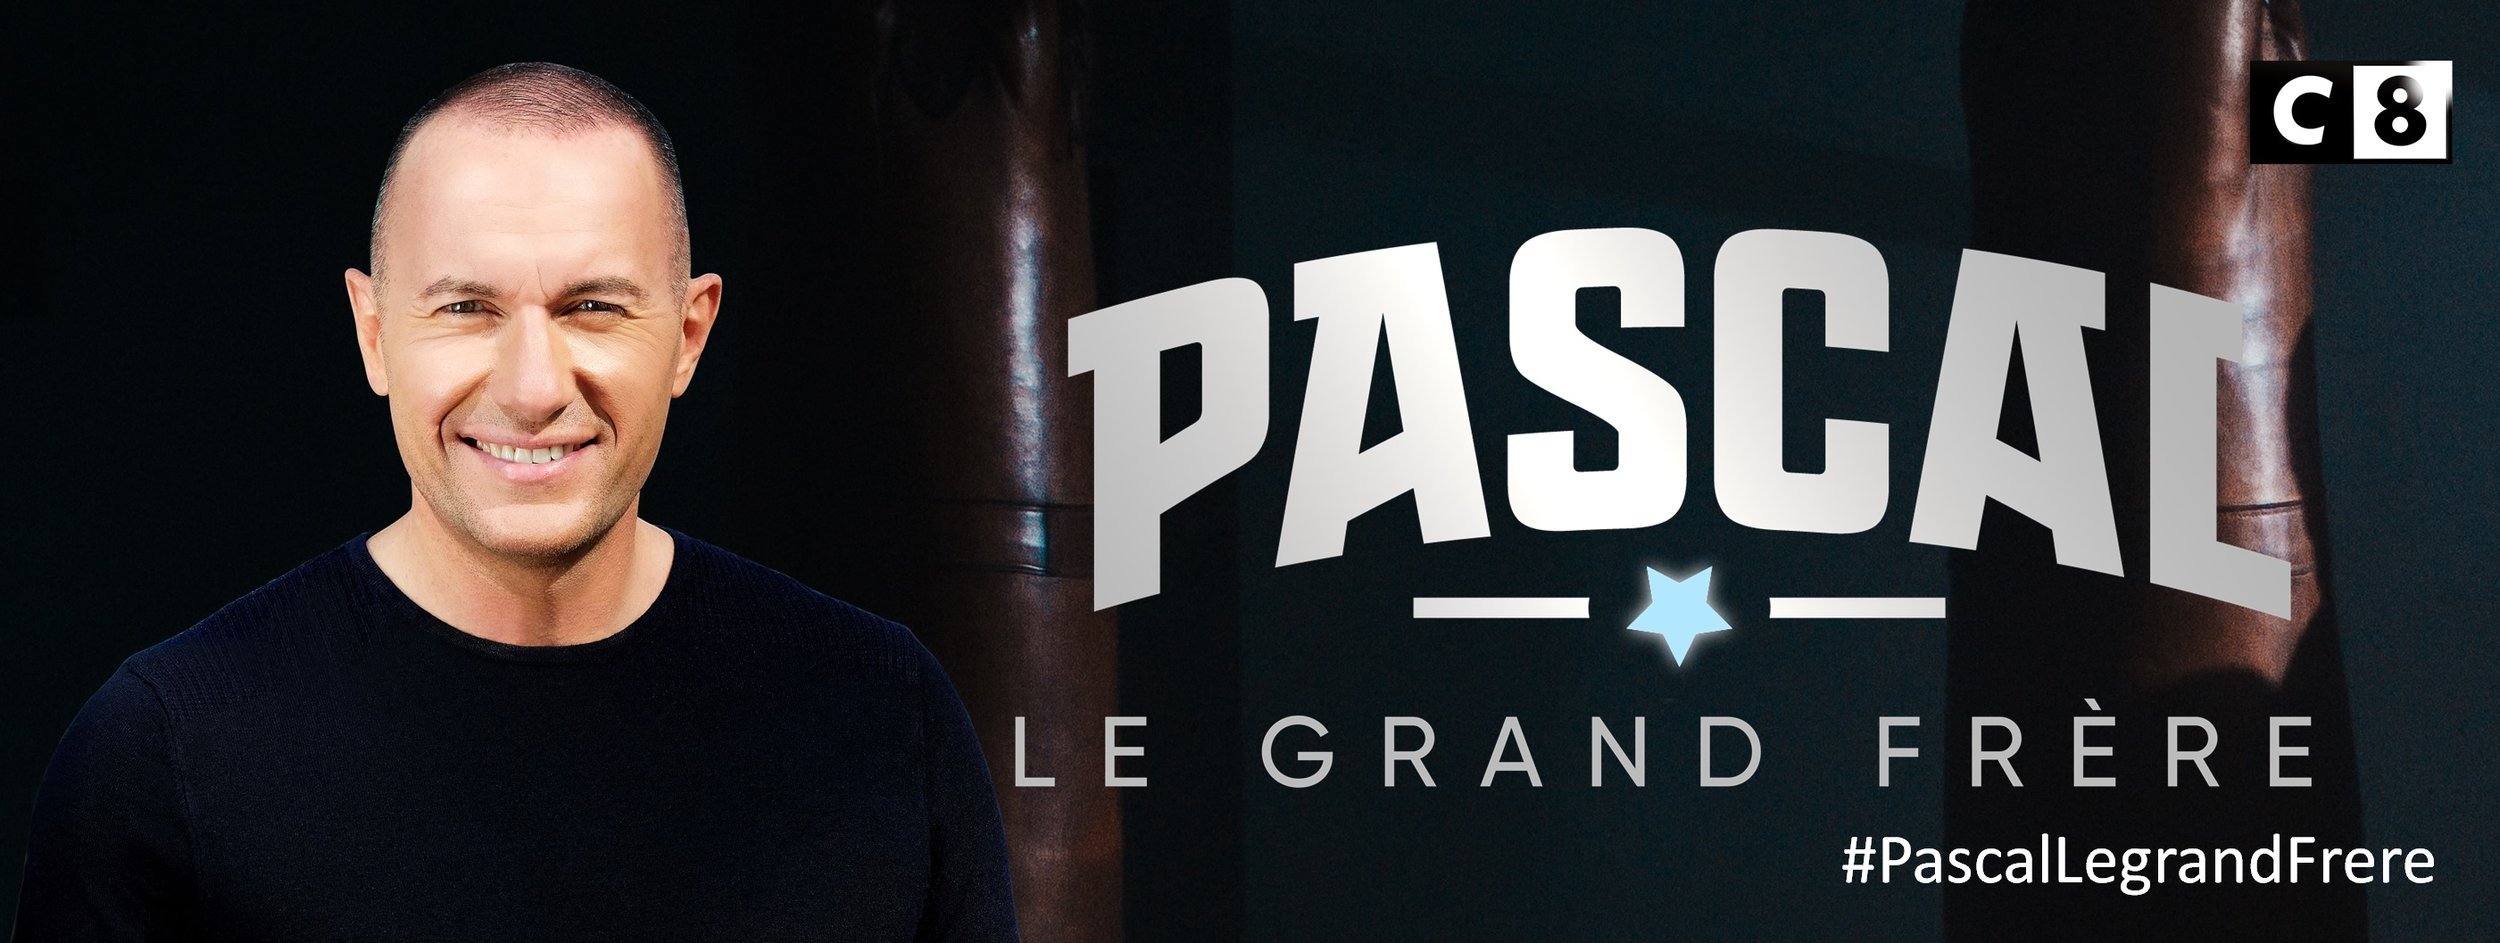 - C8 • France • 2018